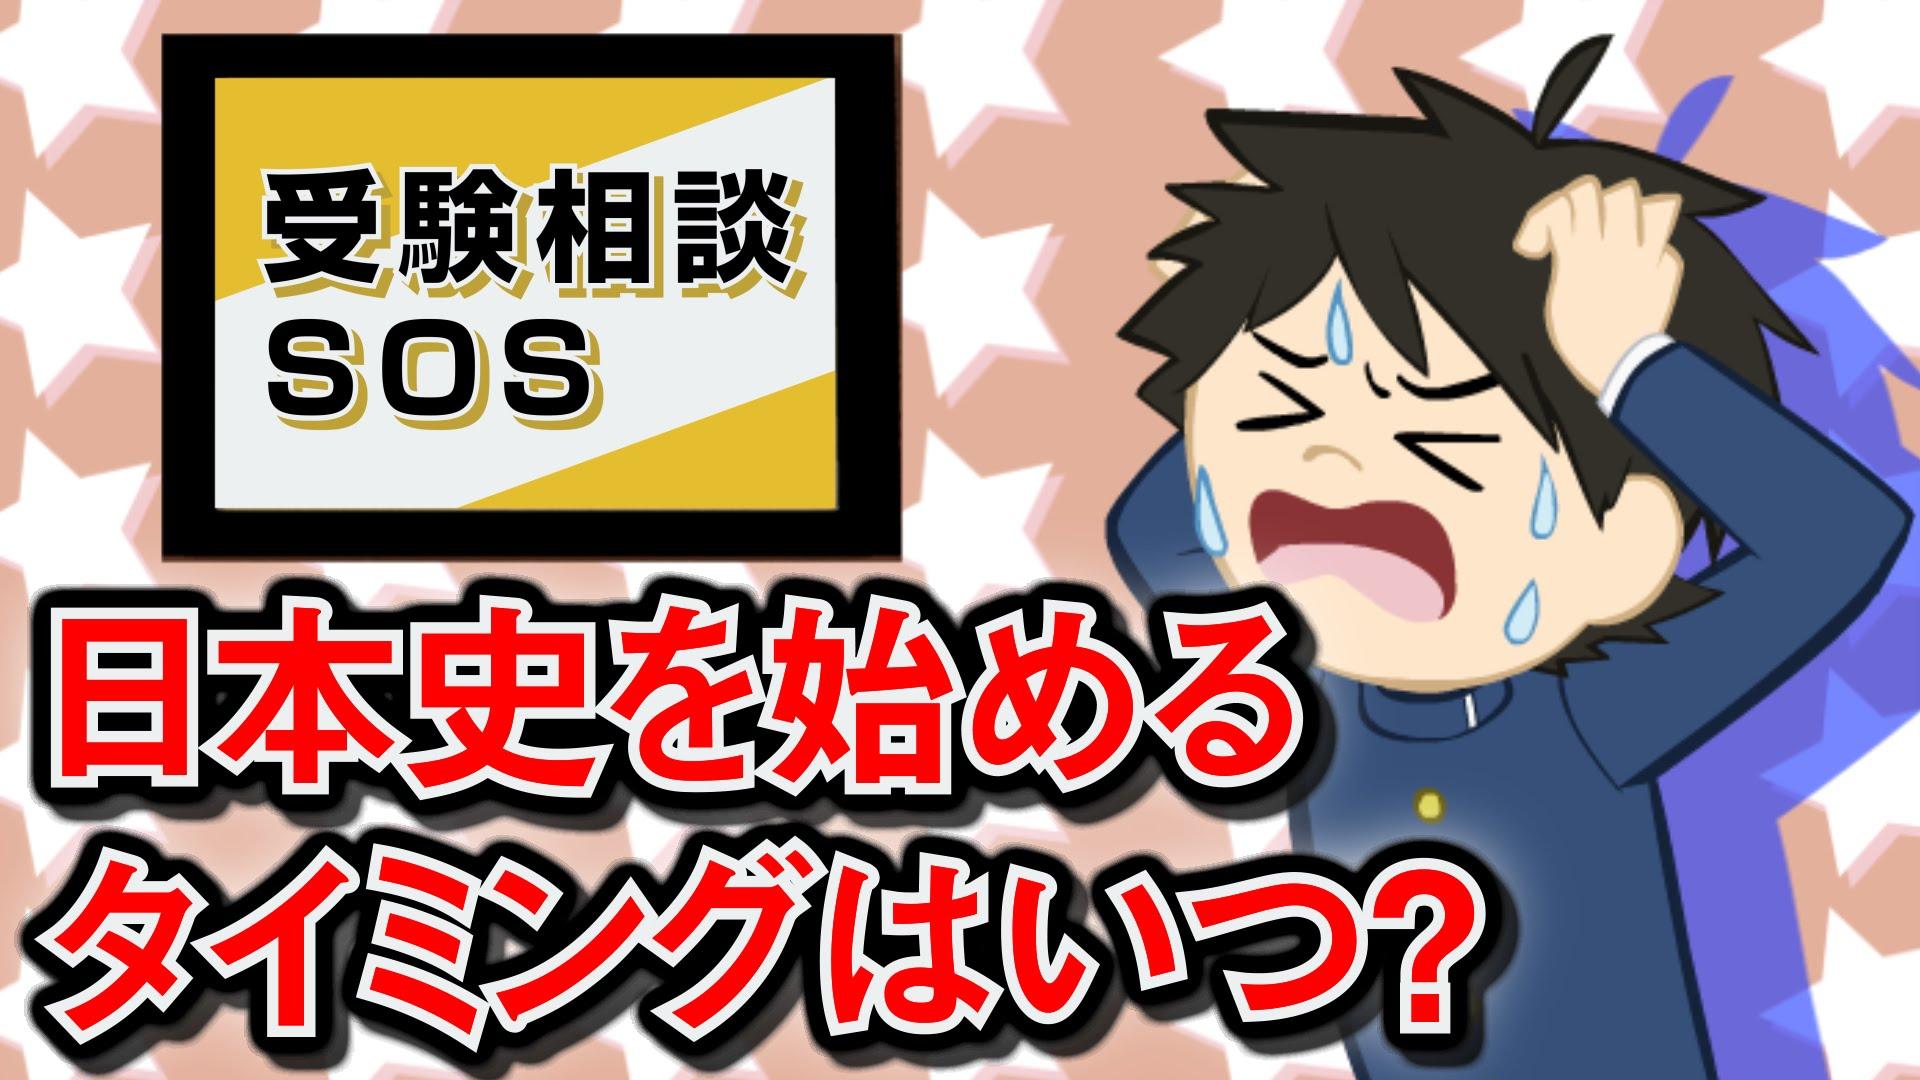 【vol.66】日本史を始める最適なタイミング!?|受験相談SOS